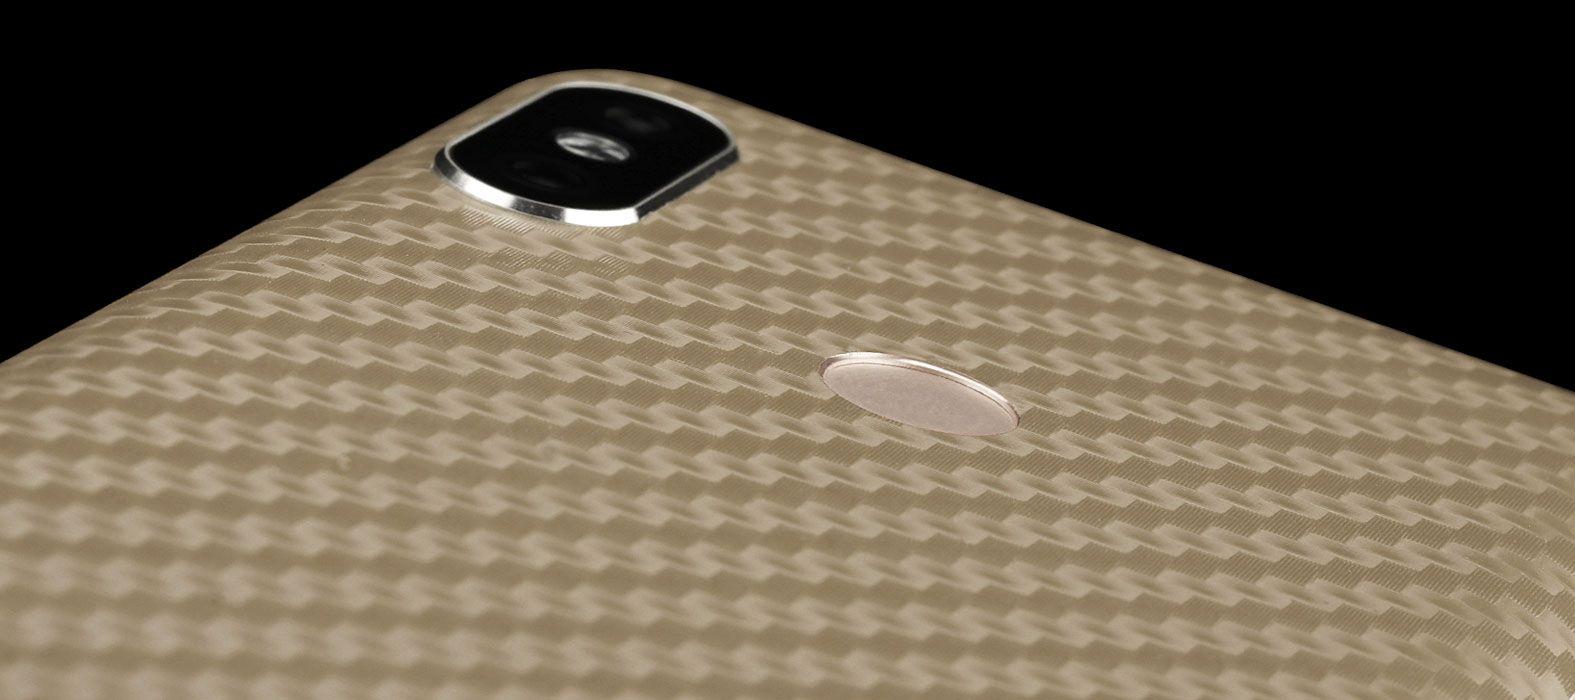 Xiaomi Redmi Note 5 Pro Skins